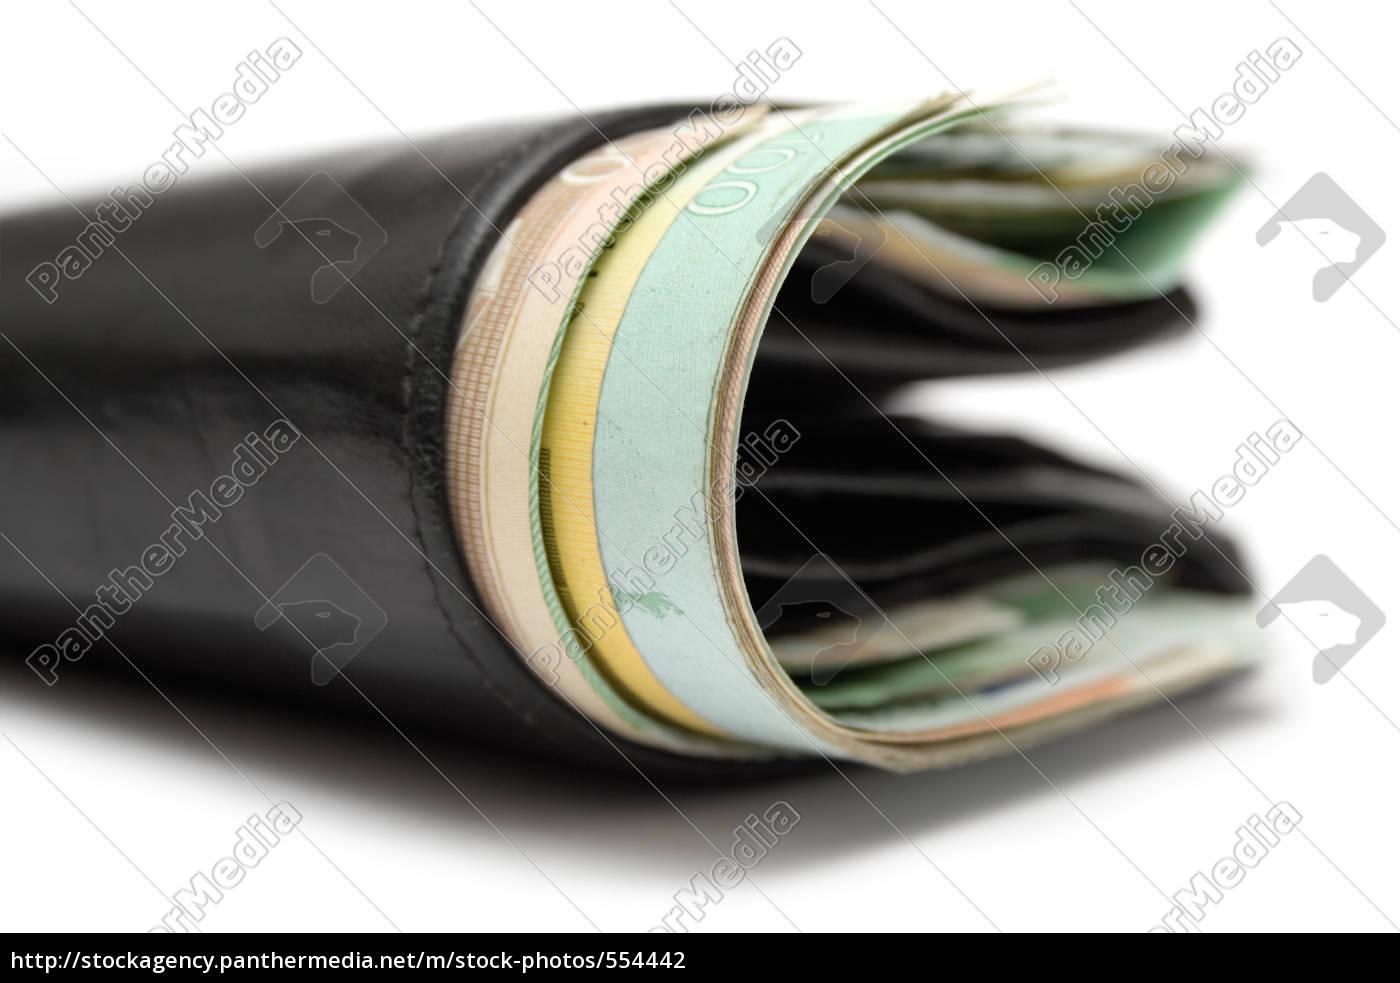 wallet - 554442